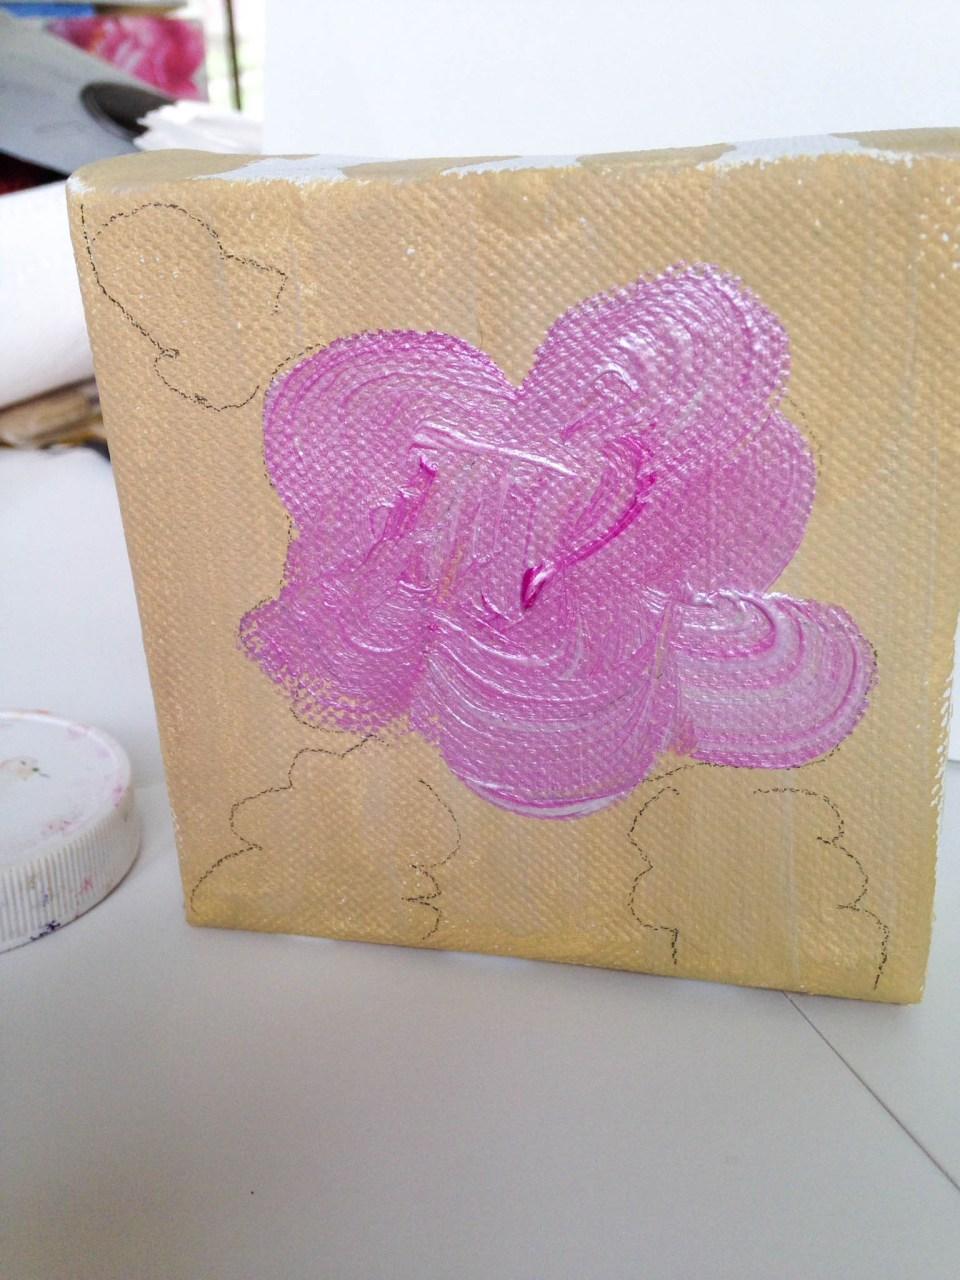 Creating Acrylic Flowers   The Postman's Knock